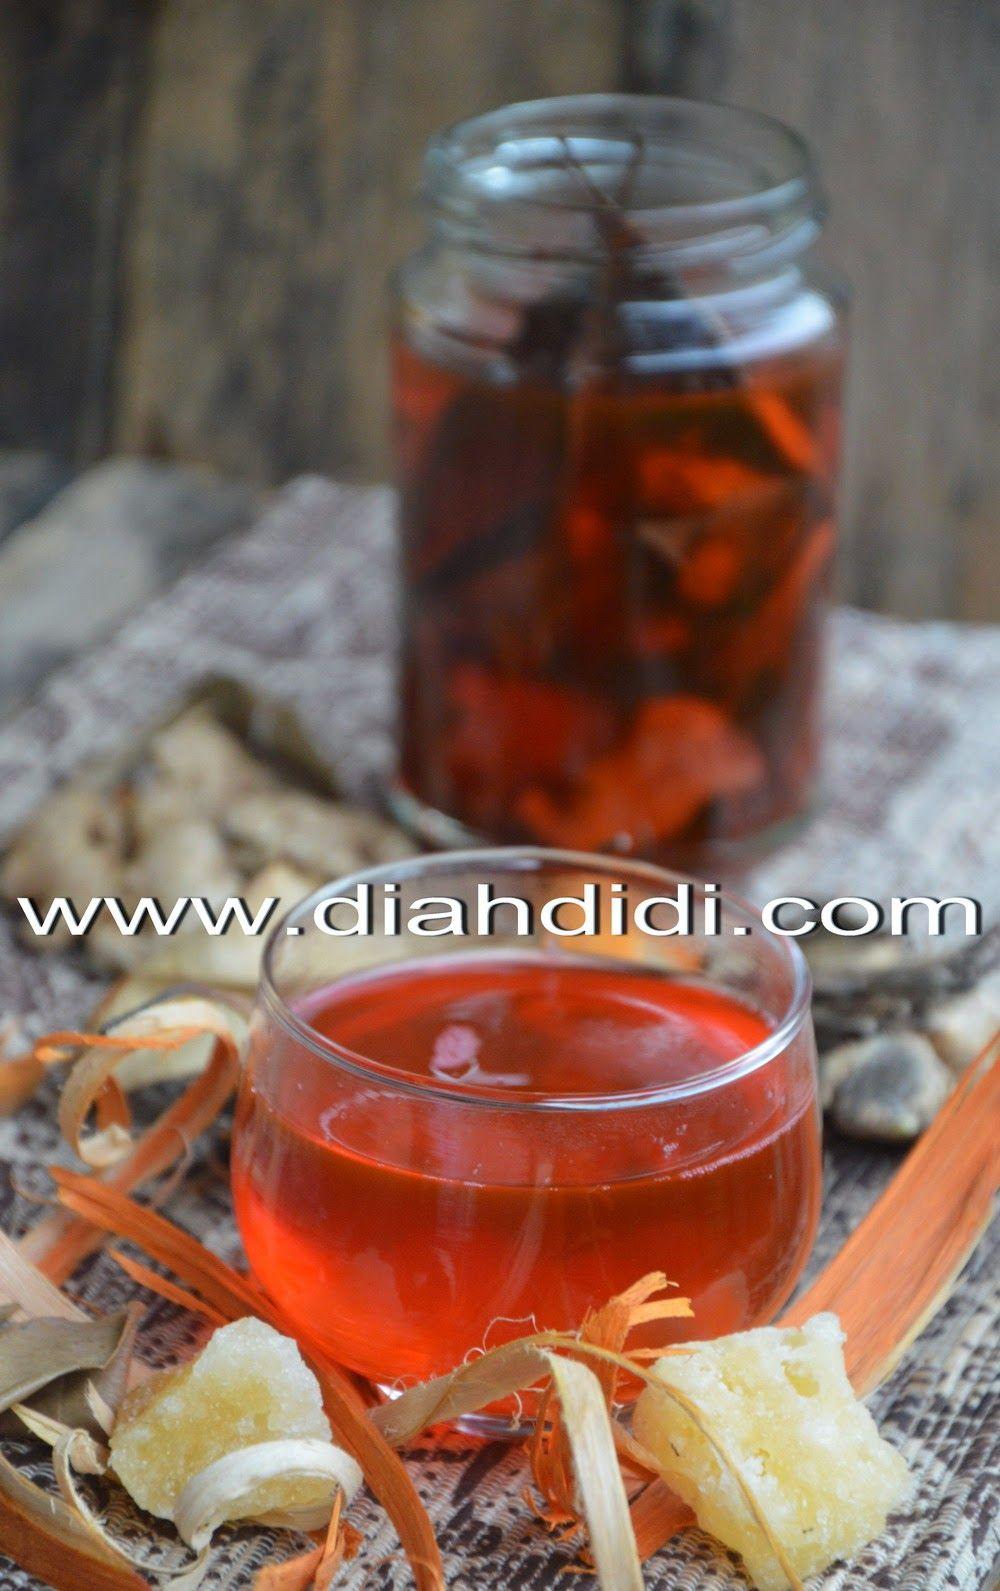 Diah Didi S Kitchen Wedang Uwuh Khas Imogiri Bantul Yogya Makanan Dan Minuman Resep Makanan Minuman Sehat